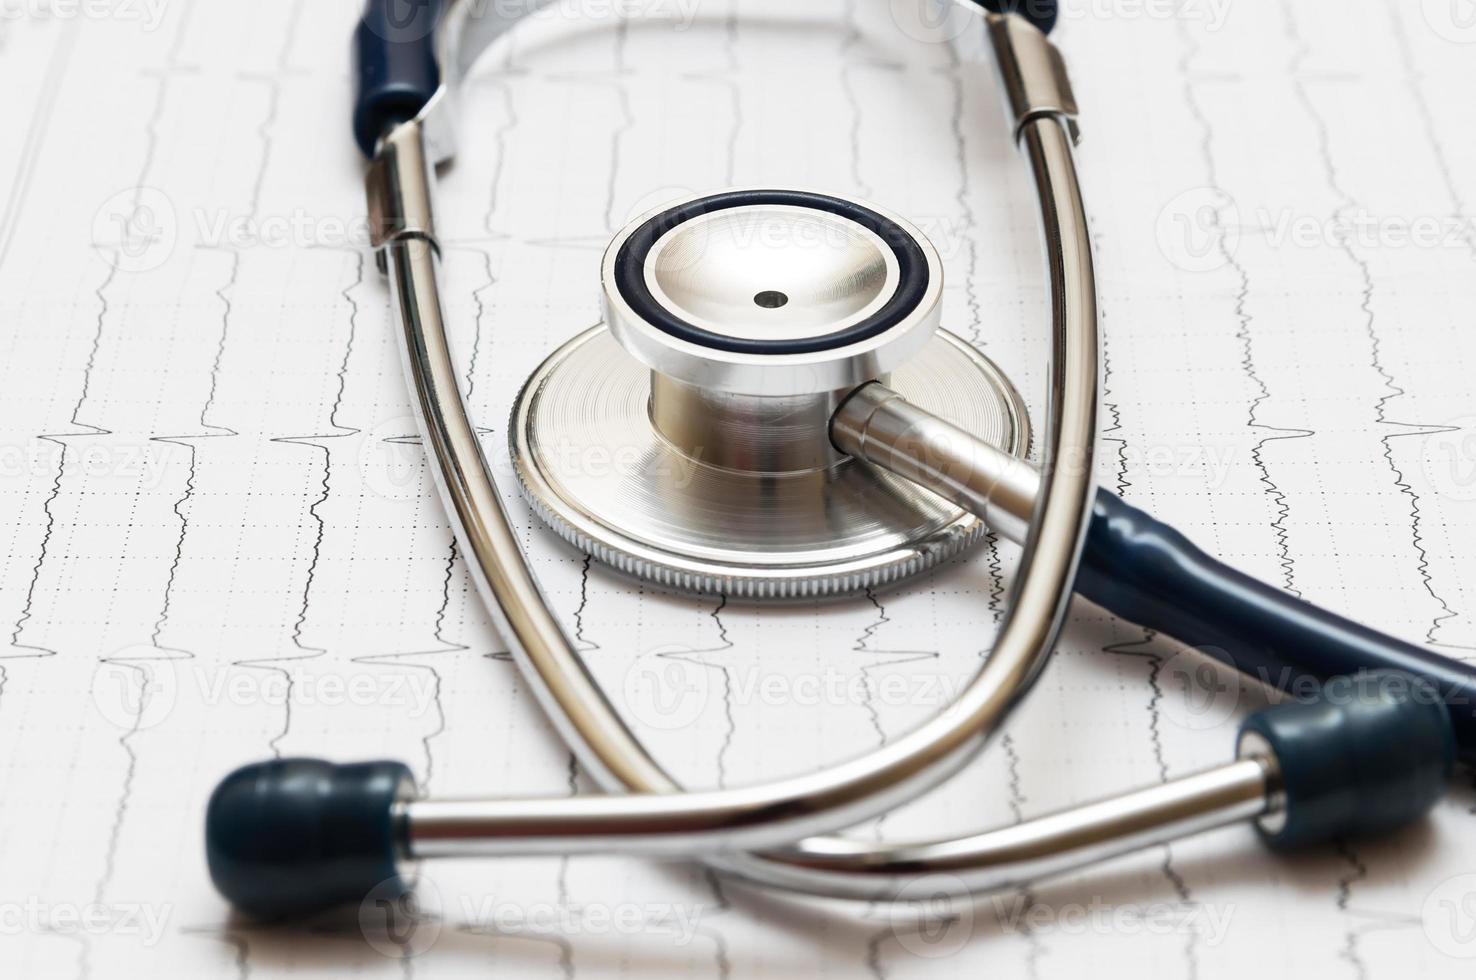 stethoscope on the cardiogram photo